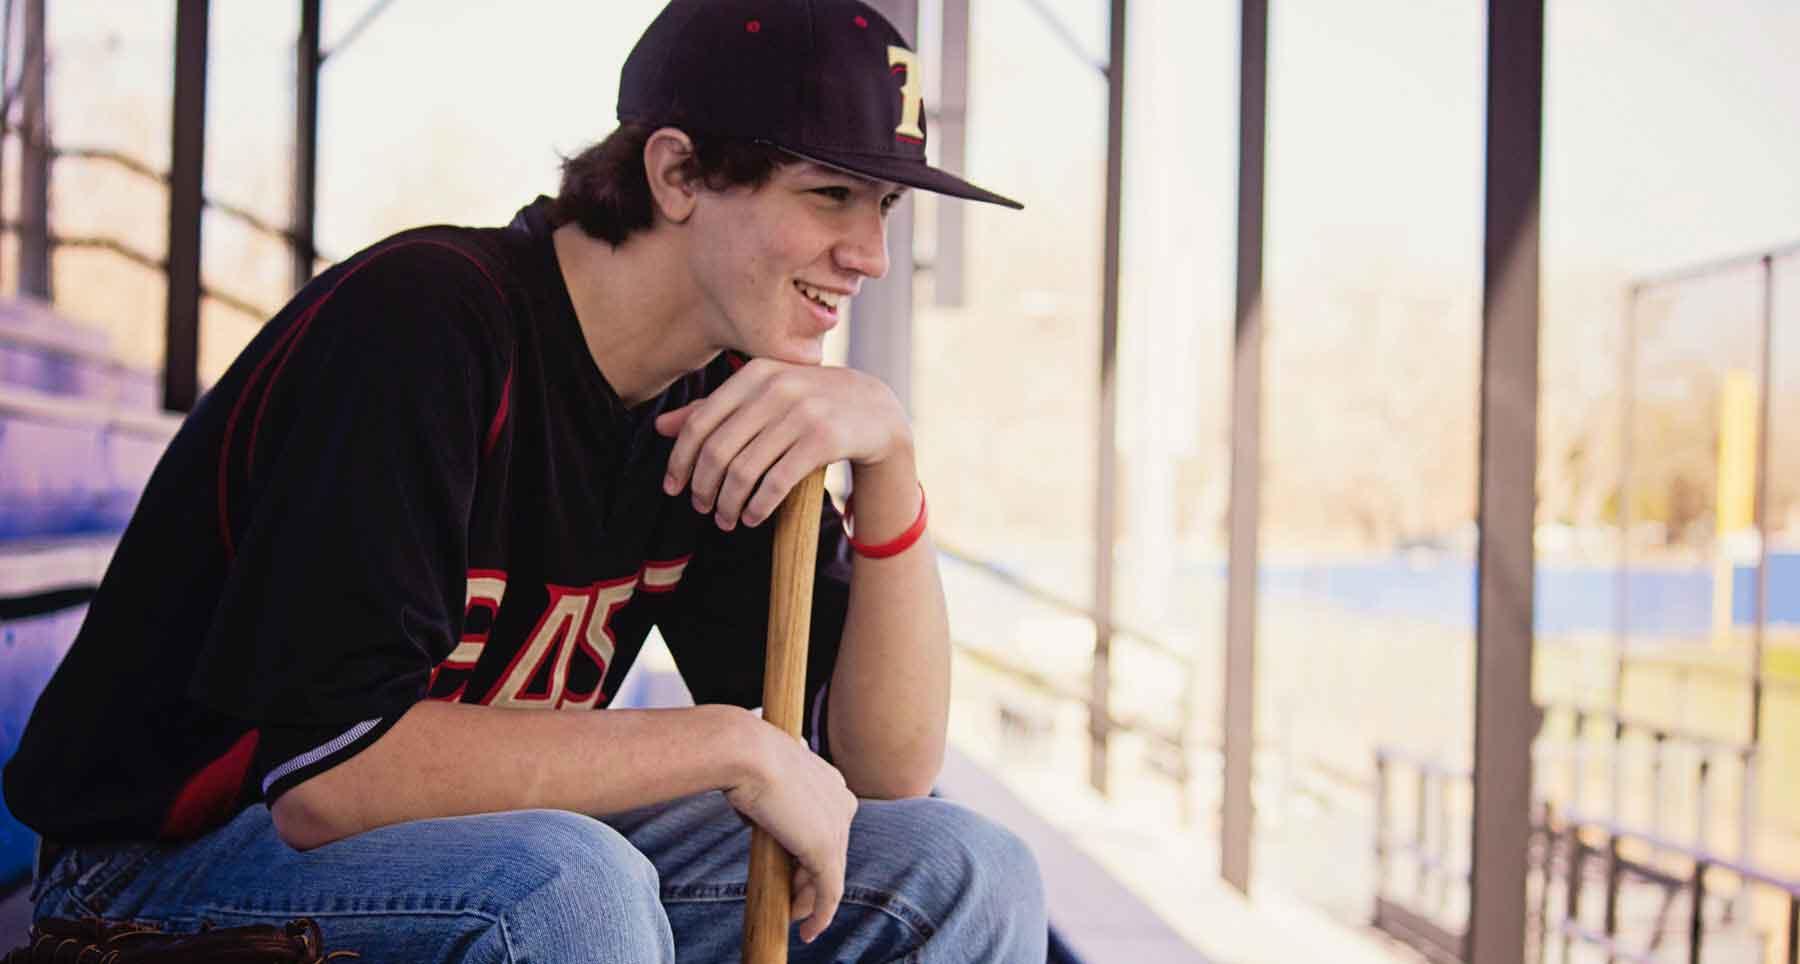 High school guy that plays baseball holding a bat